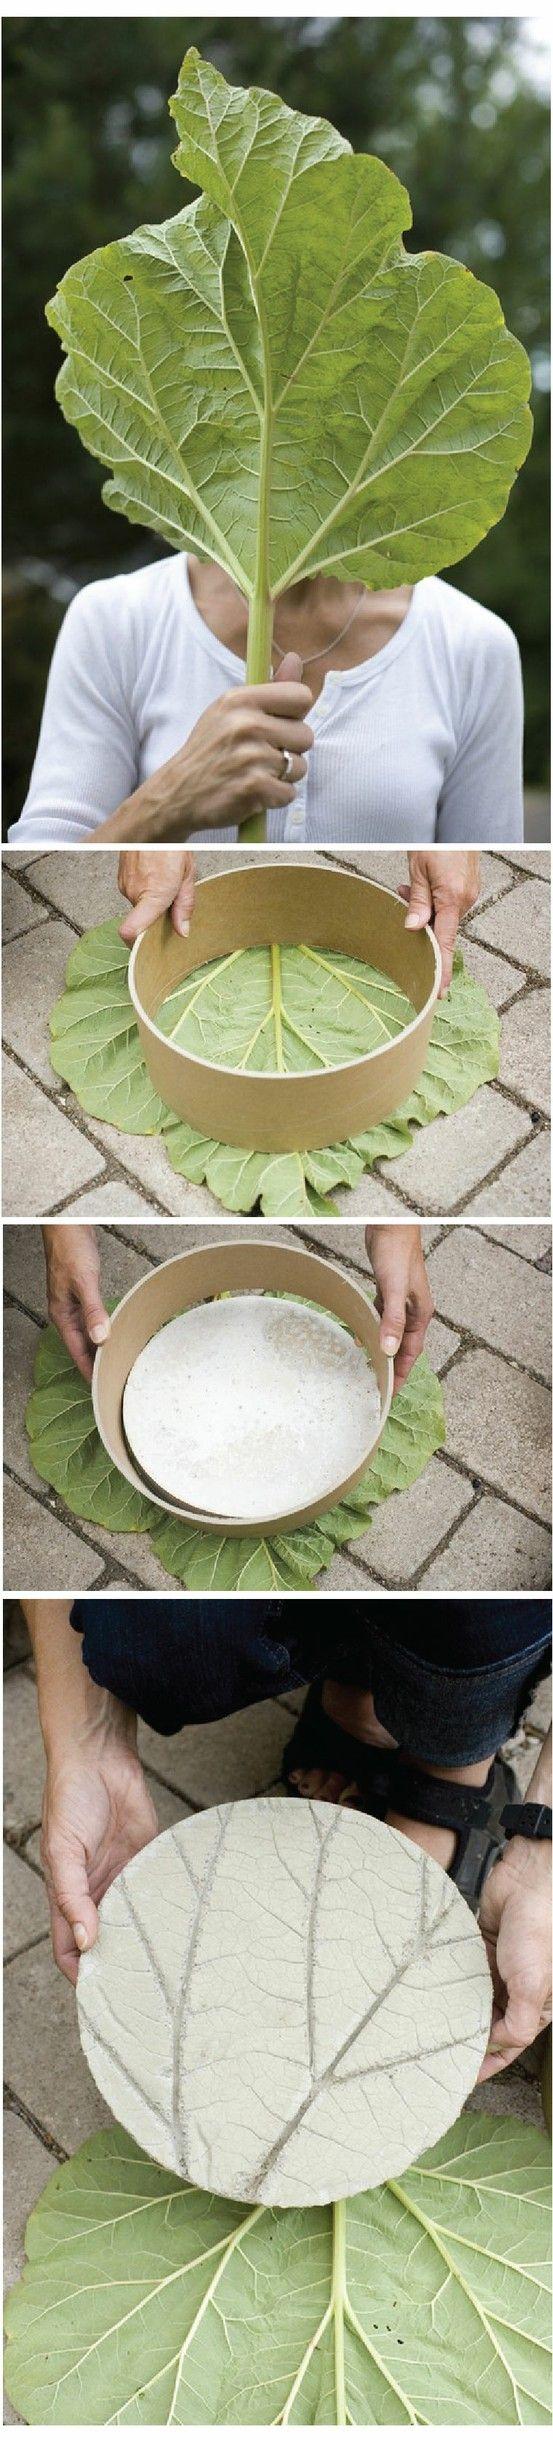 Homemade garden art ideas - Find This Pin And More On Garden Art